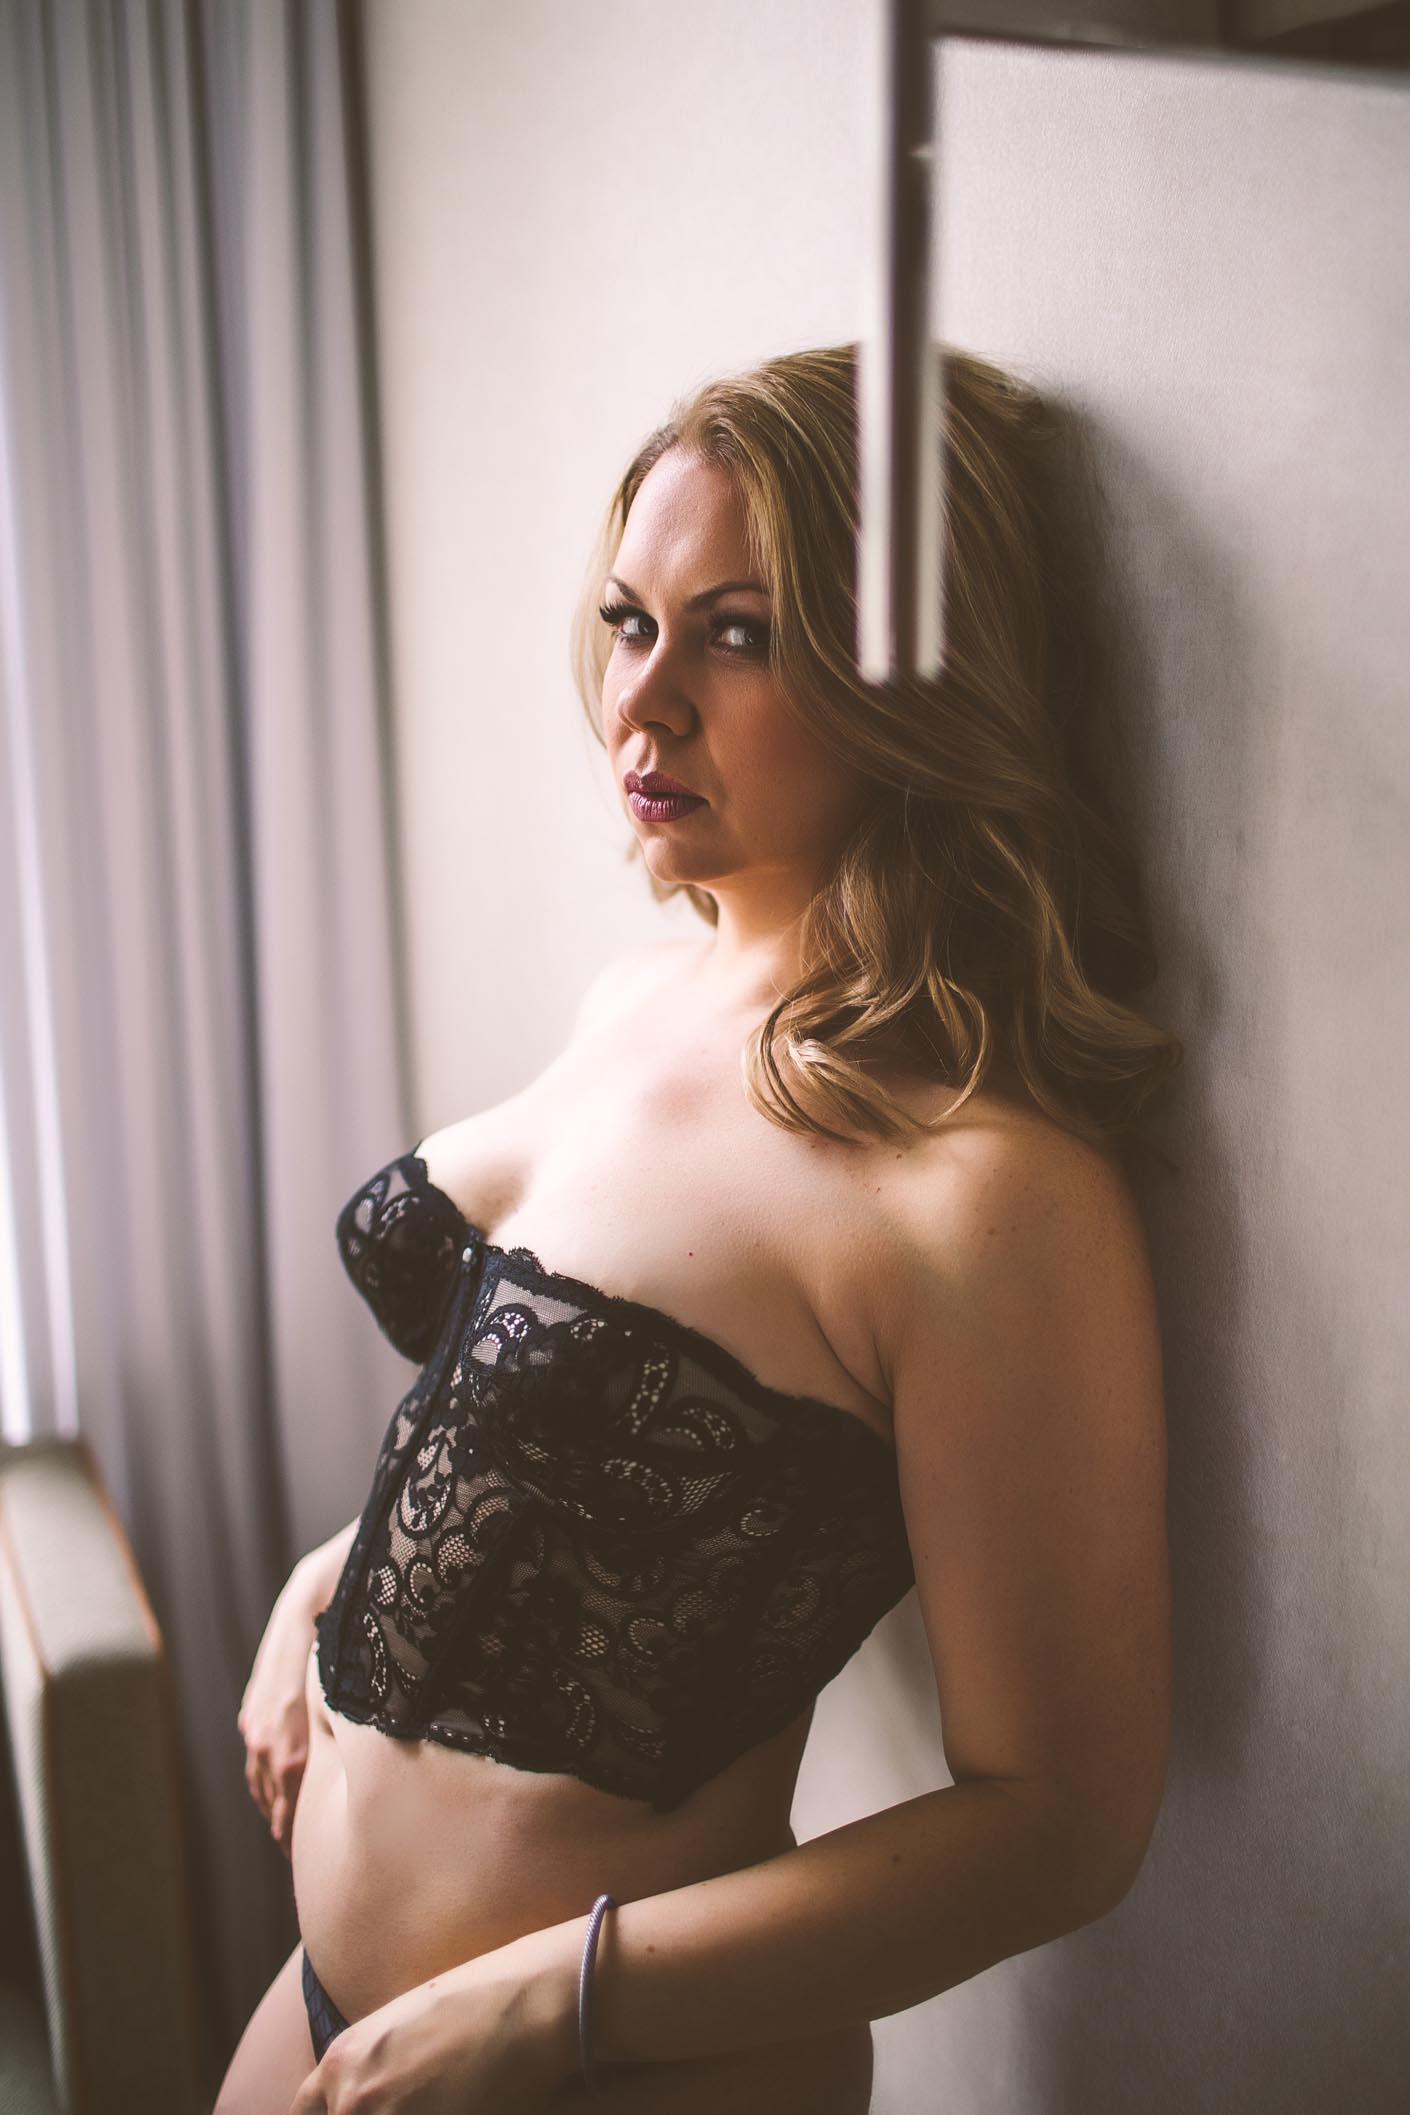 A model posing in lace lingerie